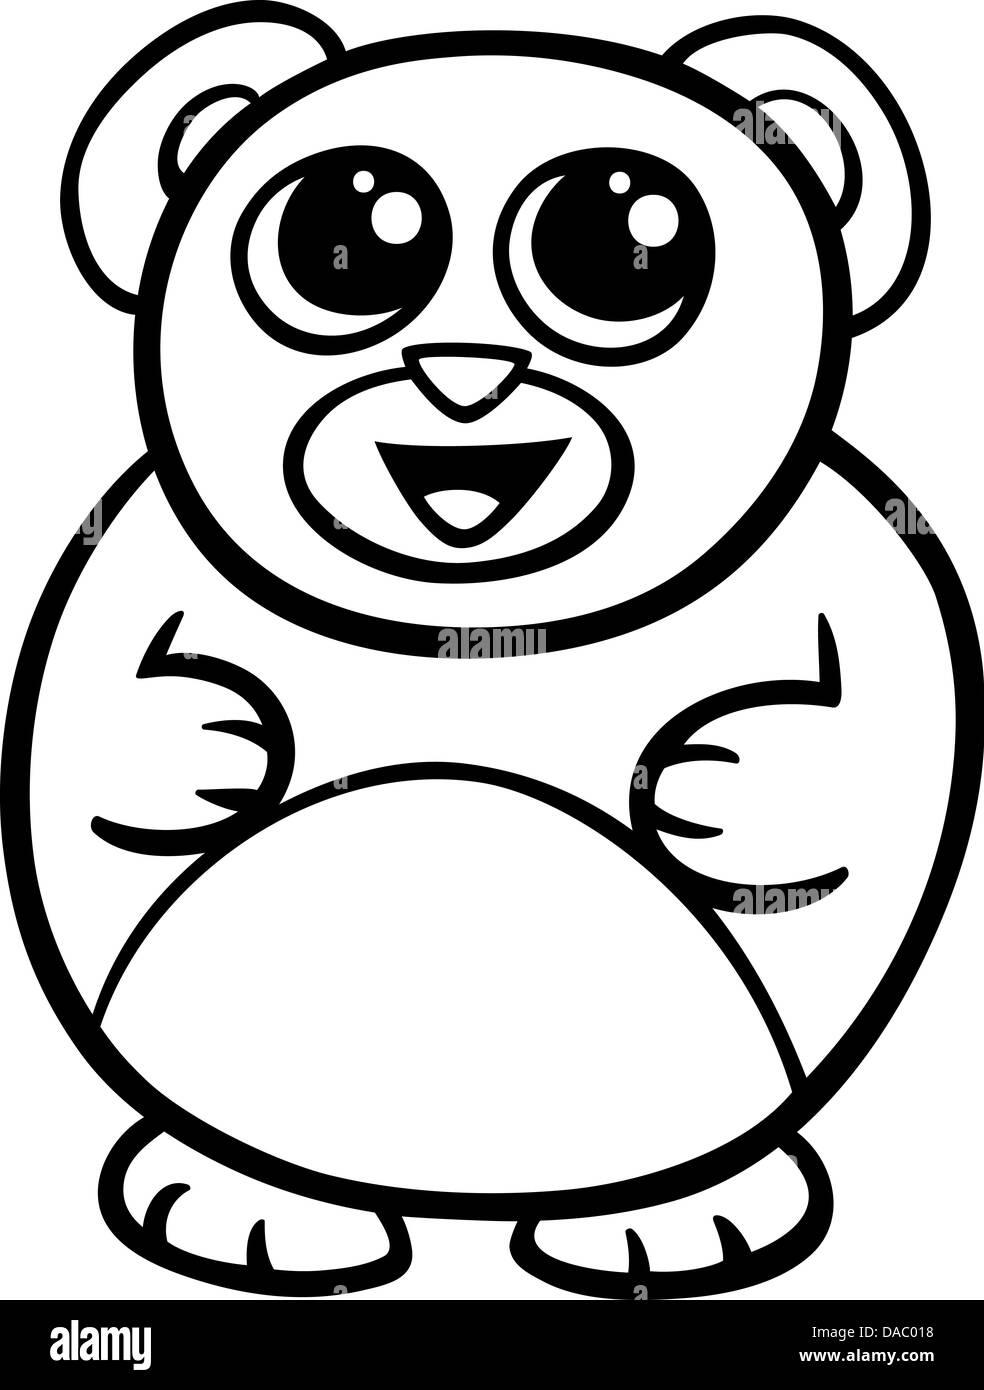 Coloriage Pingouin Kawaii.Illustration Cartoon Noir Et Blanc De Style Kawaii Cute Ours A